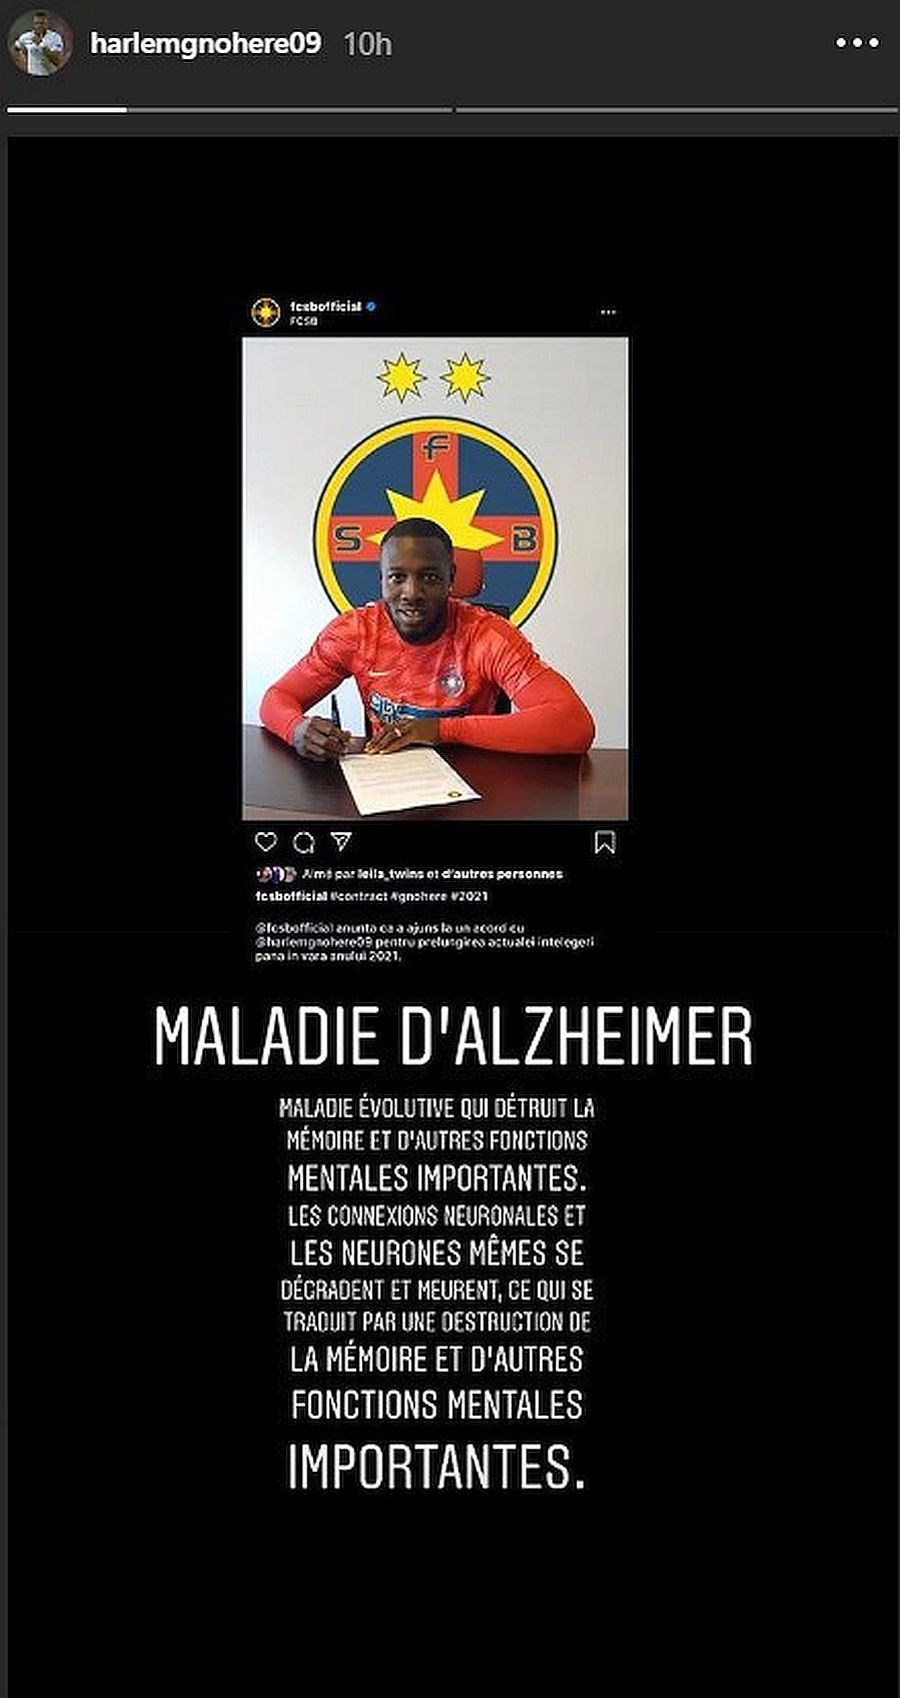 FCSB. Harlem Gnohere, atac frontal la Gigi Becali?! Postare controversată pe Instagram